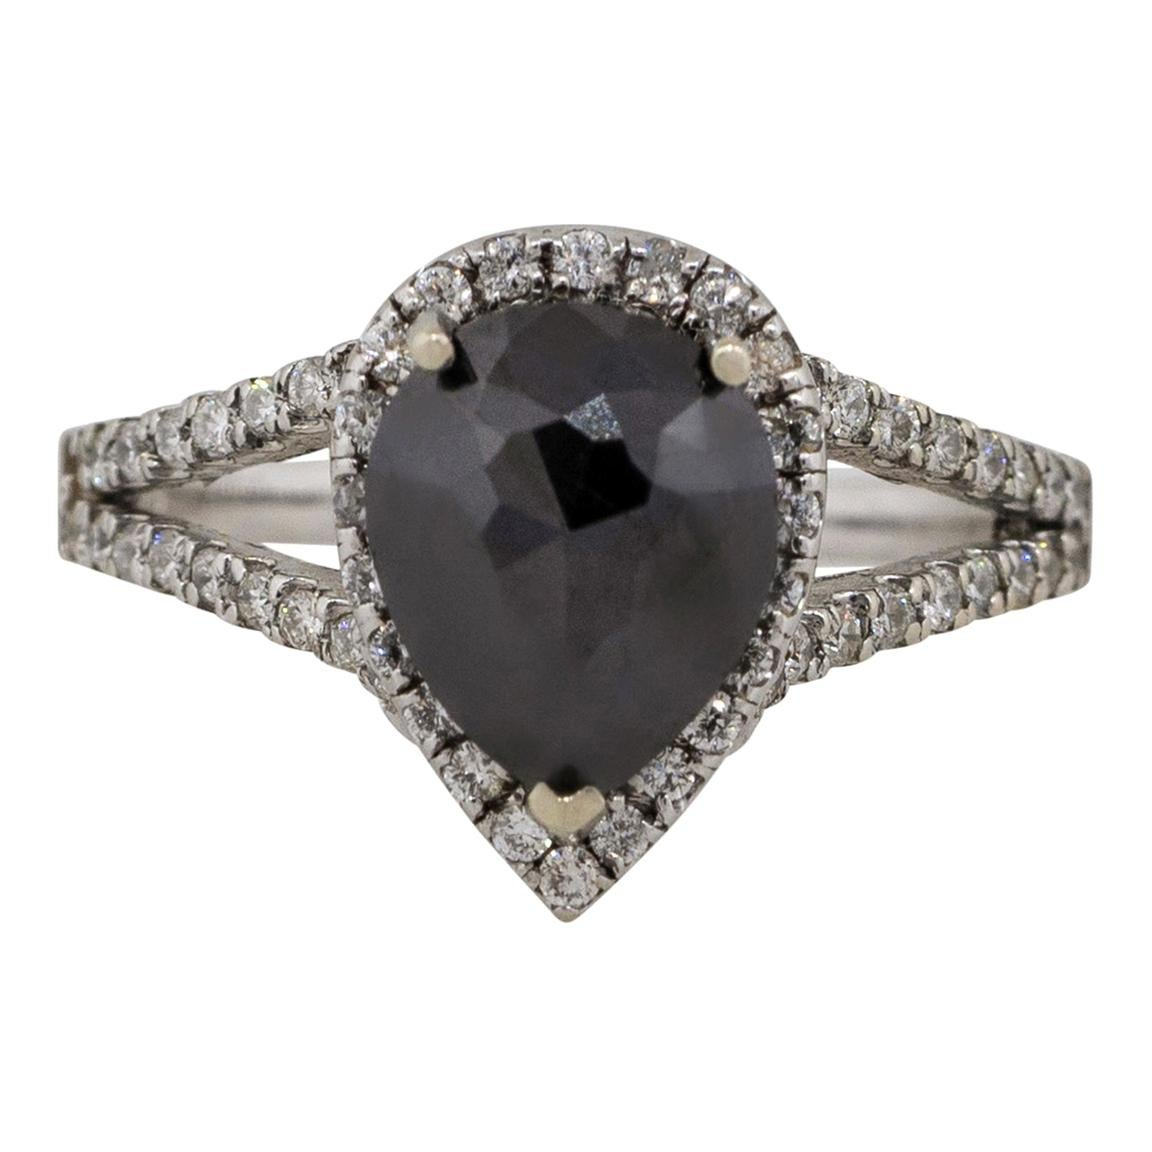 2.65 Carat Black and White Diamond Pear Shape Ring 14 Karat in Stock